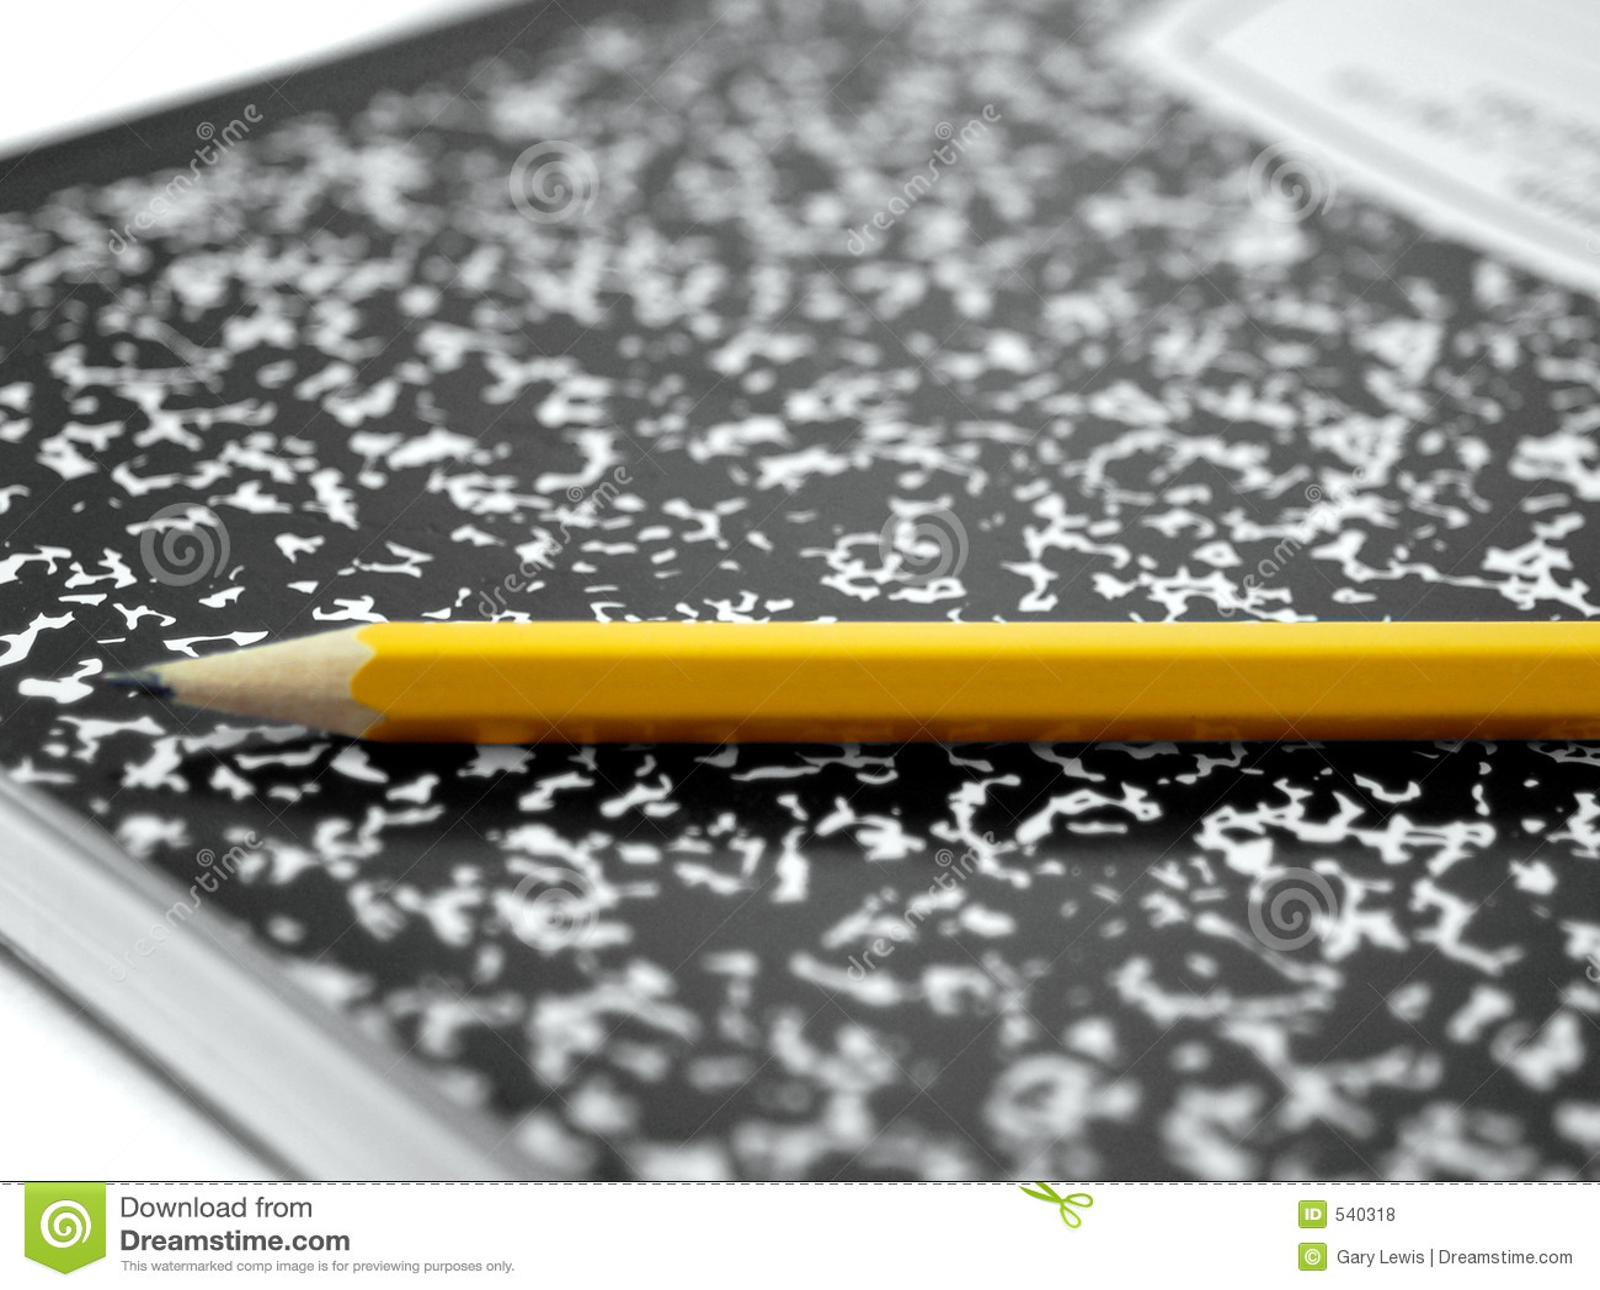 Download 书构成铅笔 库存照片. 图片 包括有 backarrow, 纸张, 盖子, 经典, 家庭作业, 文件, 诗歌 - 540318